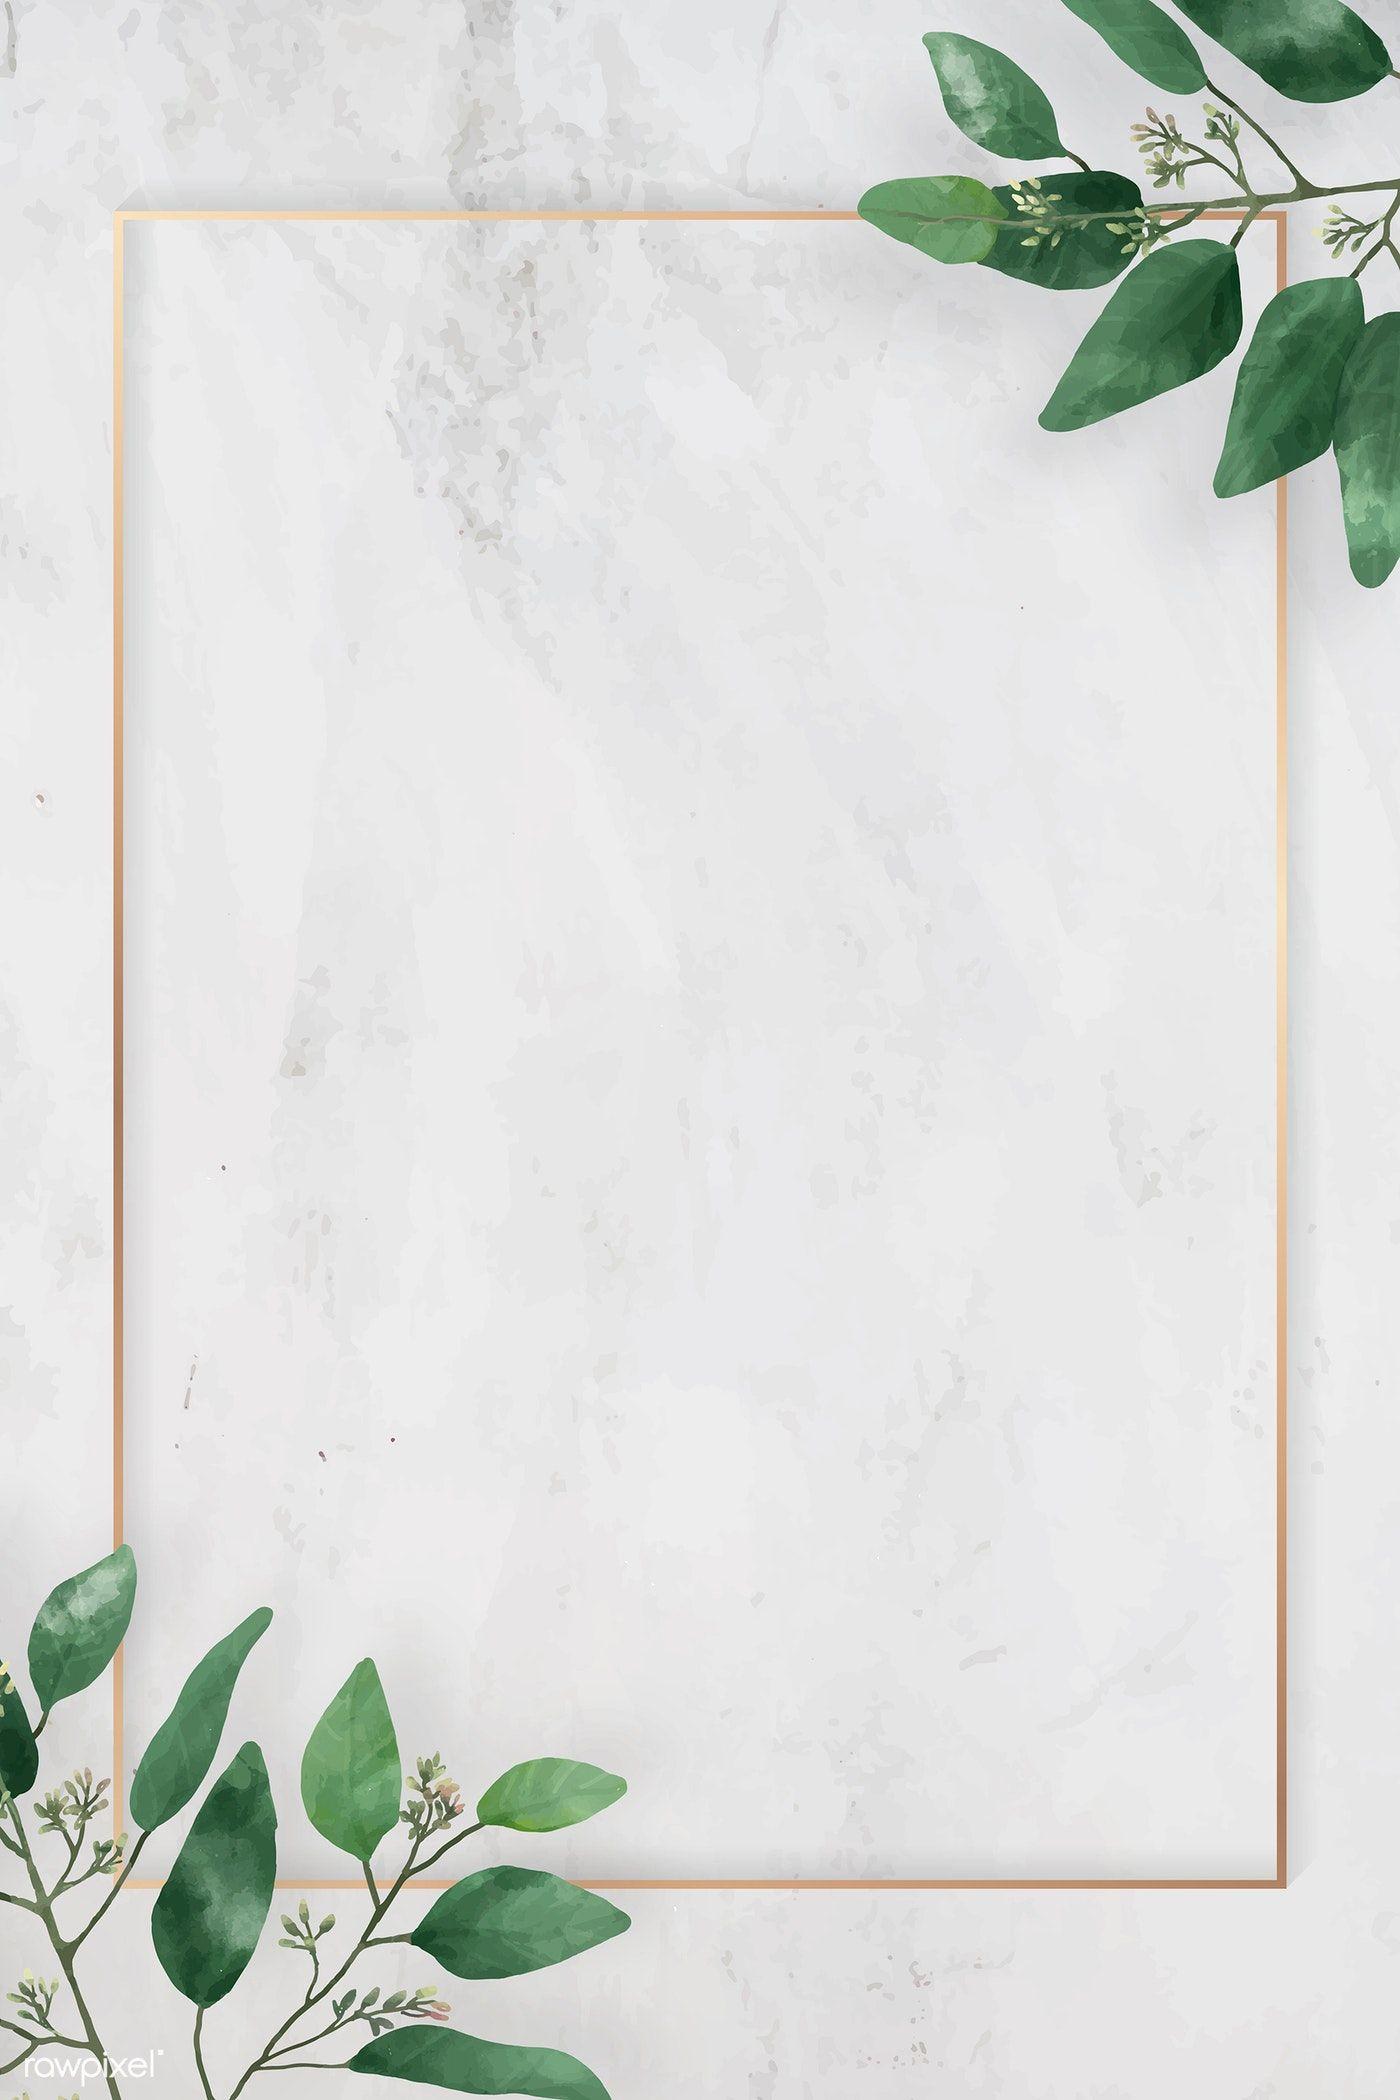 Download Premium Vector Of Blank Rectangle Camellia Leaves Frame Vector Flower Background Wallpaper Floral Poster Artsy Background